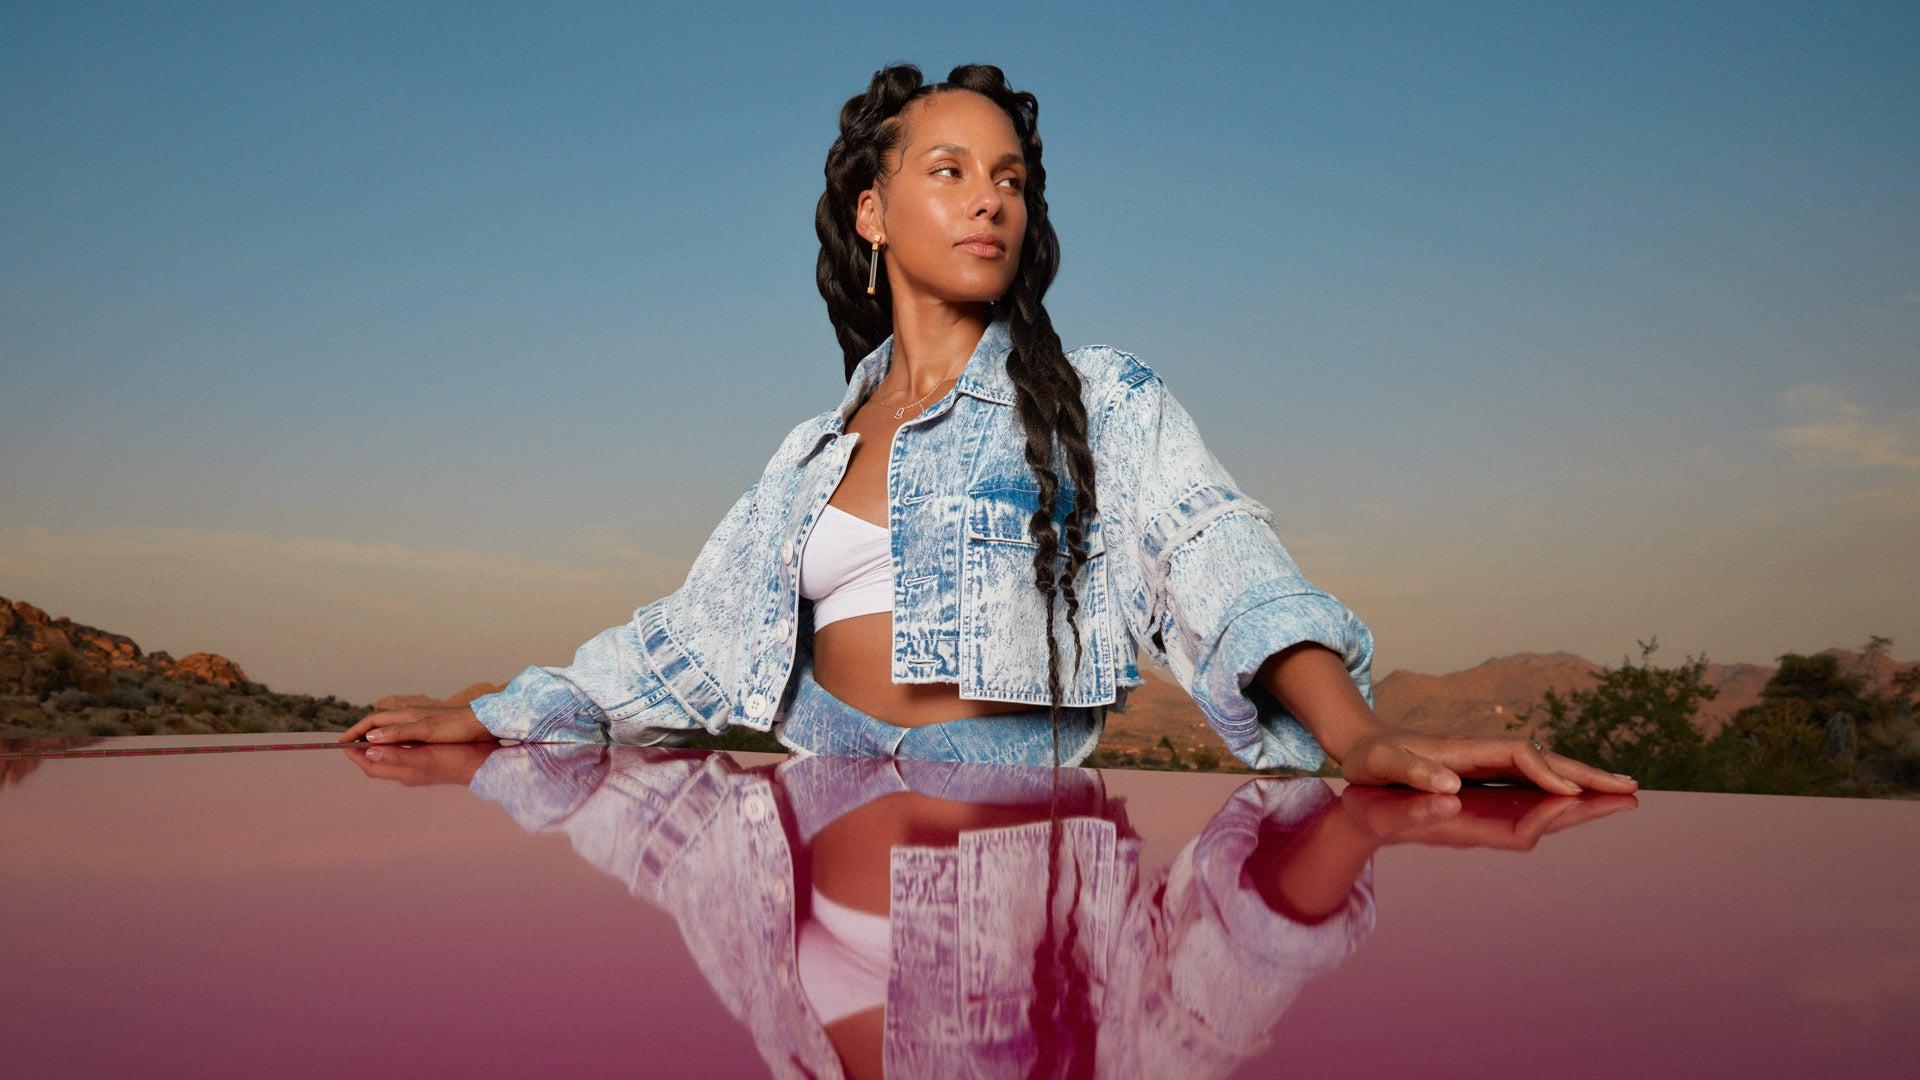 New Music Vol. 15 feat. Alicia Keys, Justin Bieber, Ava Max and more!